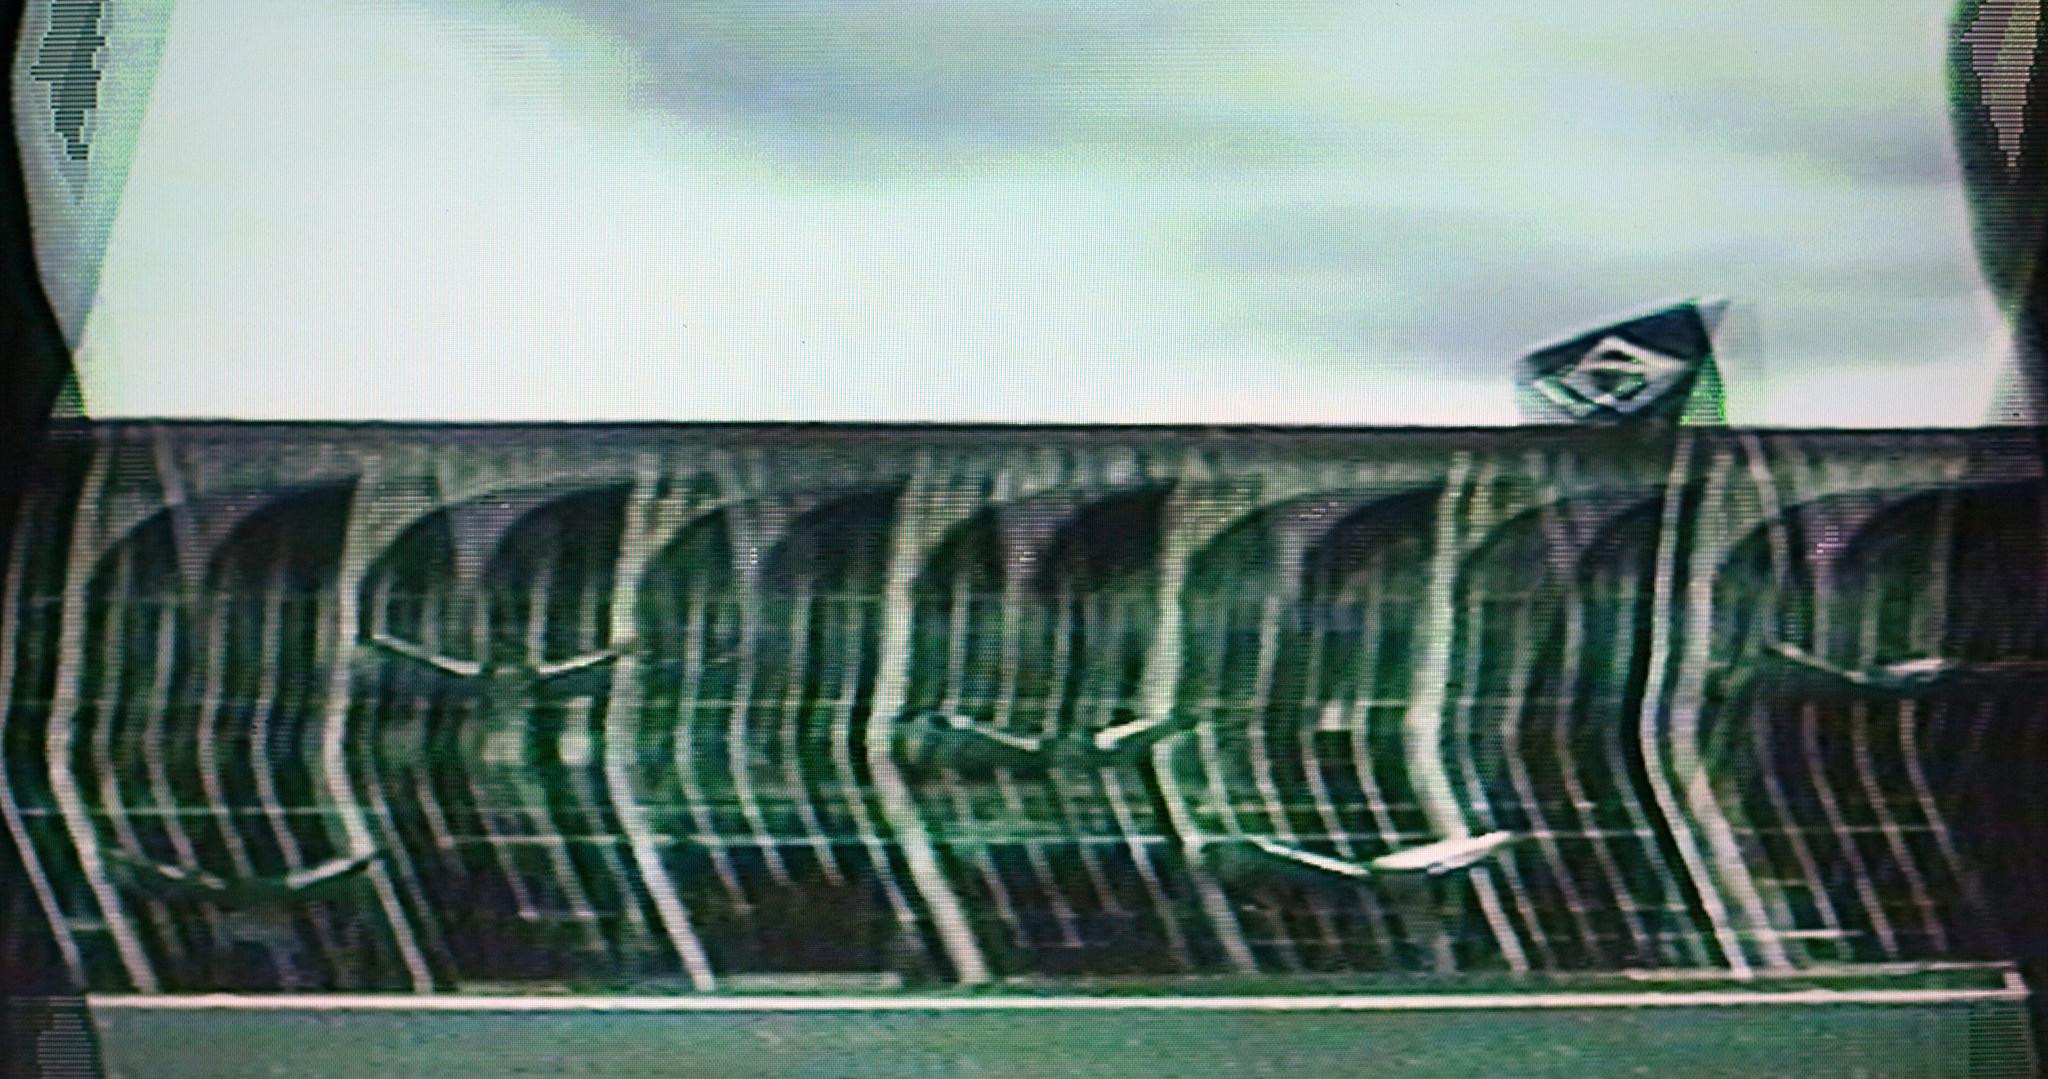 Palácio da Justiça  Audiofile: Carreata no Rio de Janeiro - Campo Grande! (Autokorso in Rio de Janeiro)